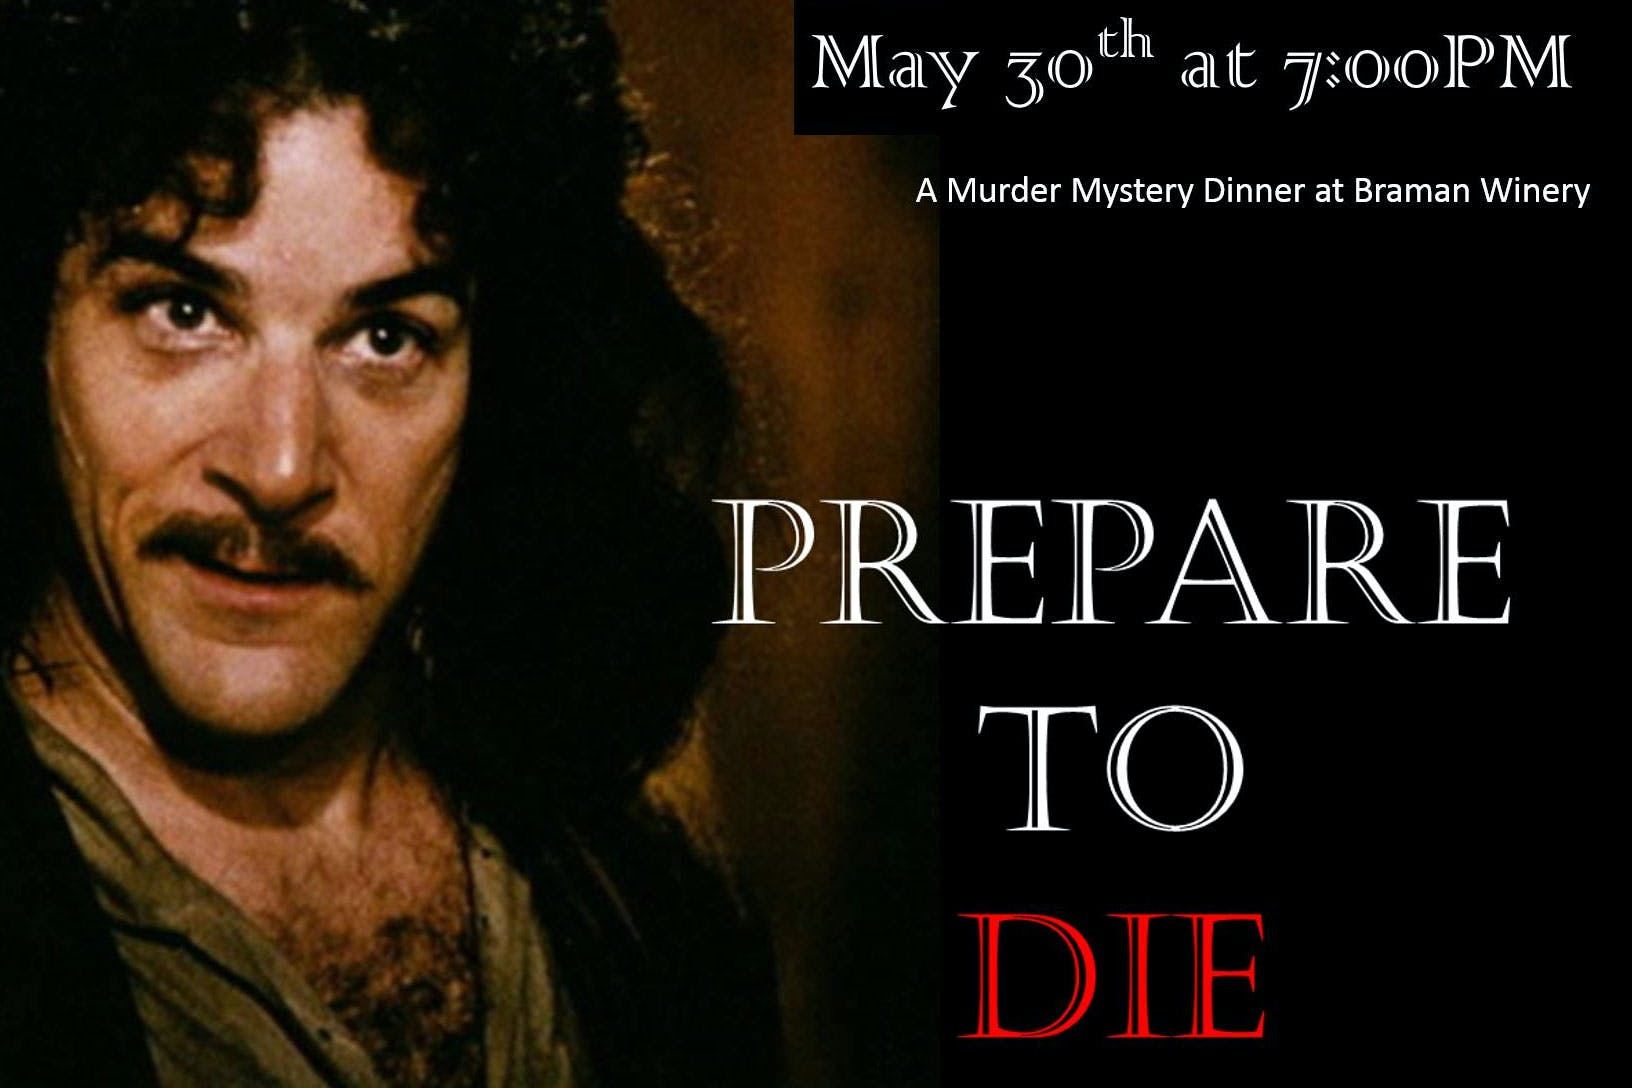 Murder-Mystery-Dinner-Braman-Winery